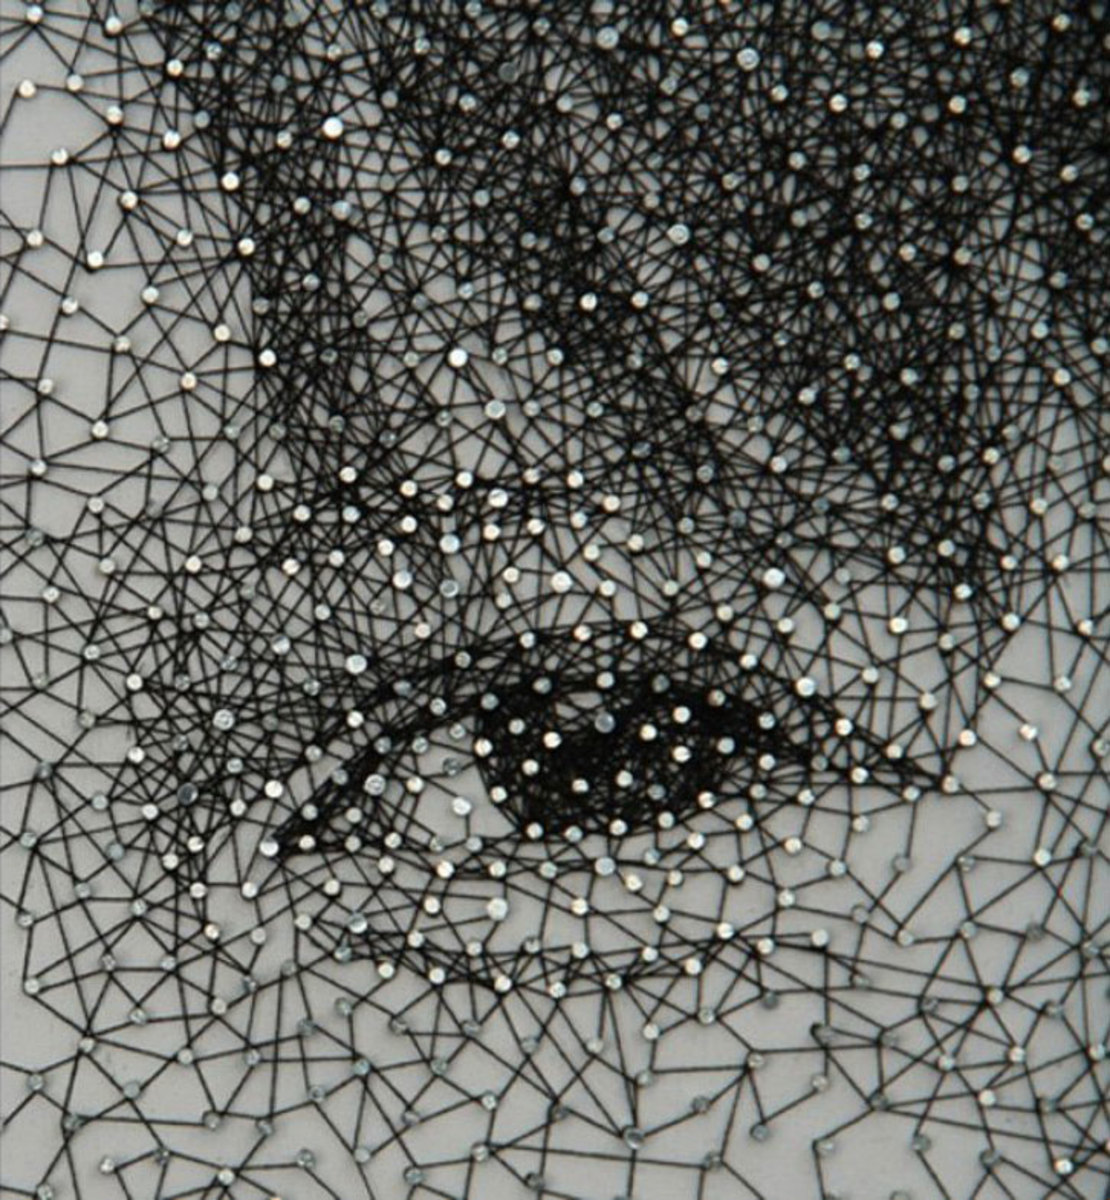 portraits-made-from-single-thread-wrapped-around-nails-kumi-yamashita-7